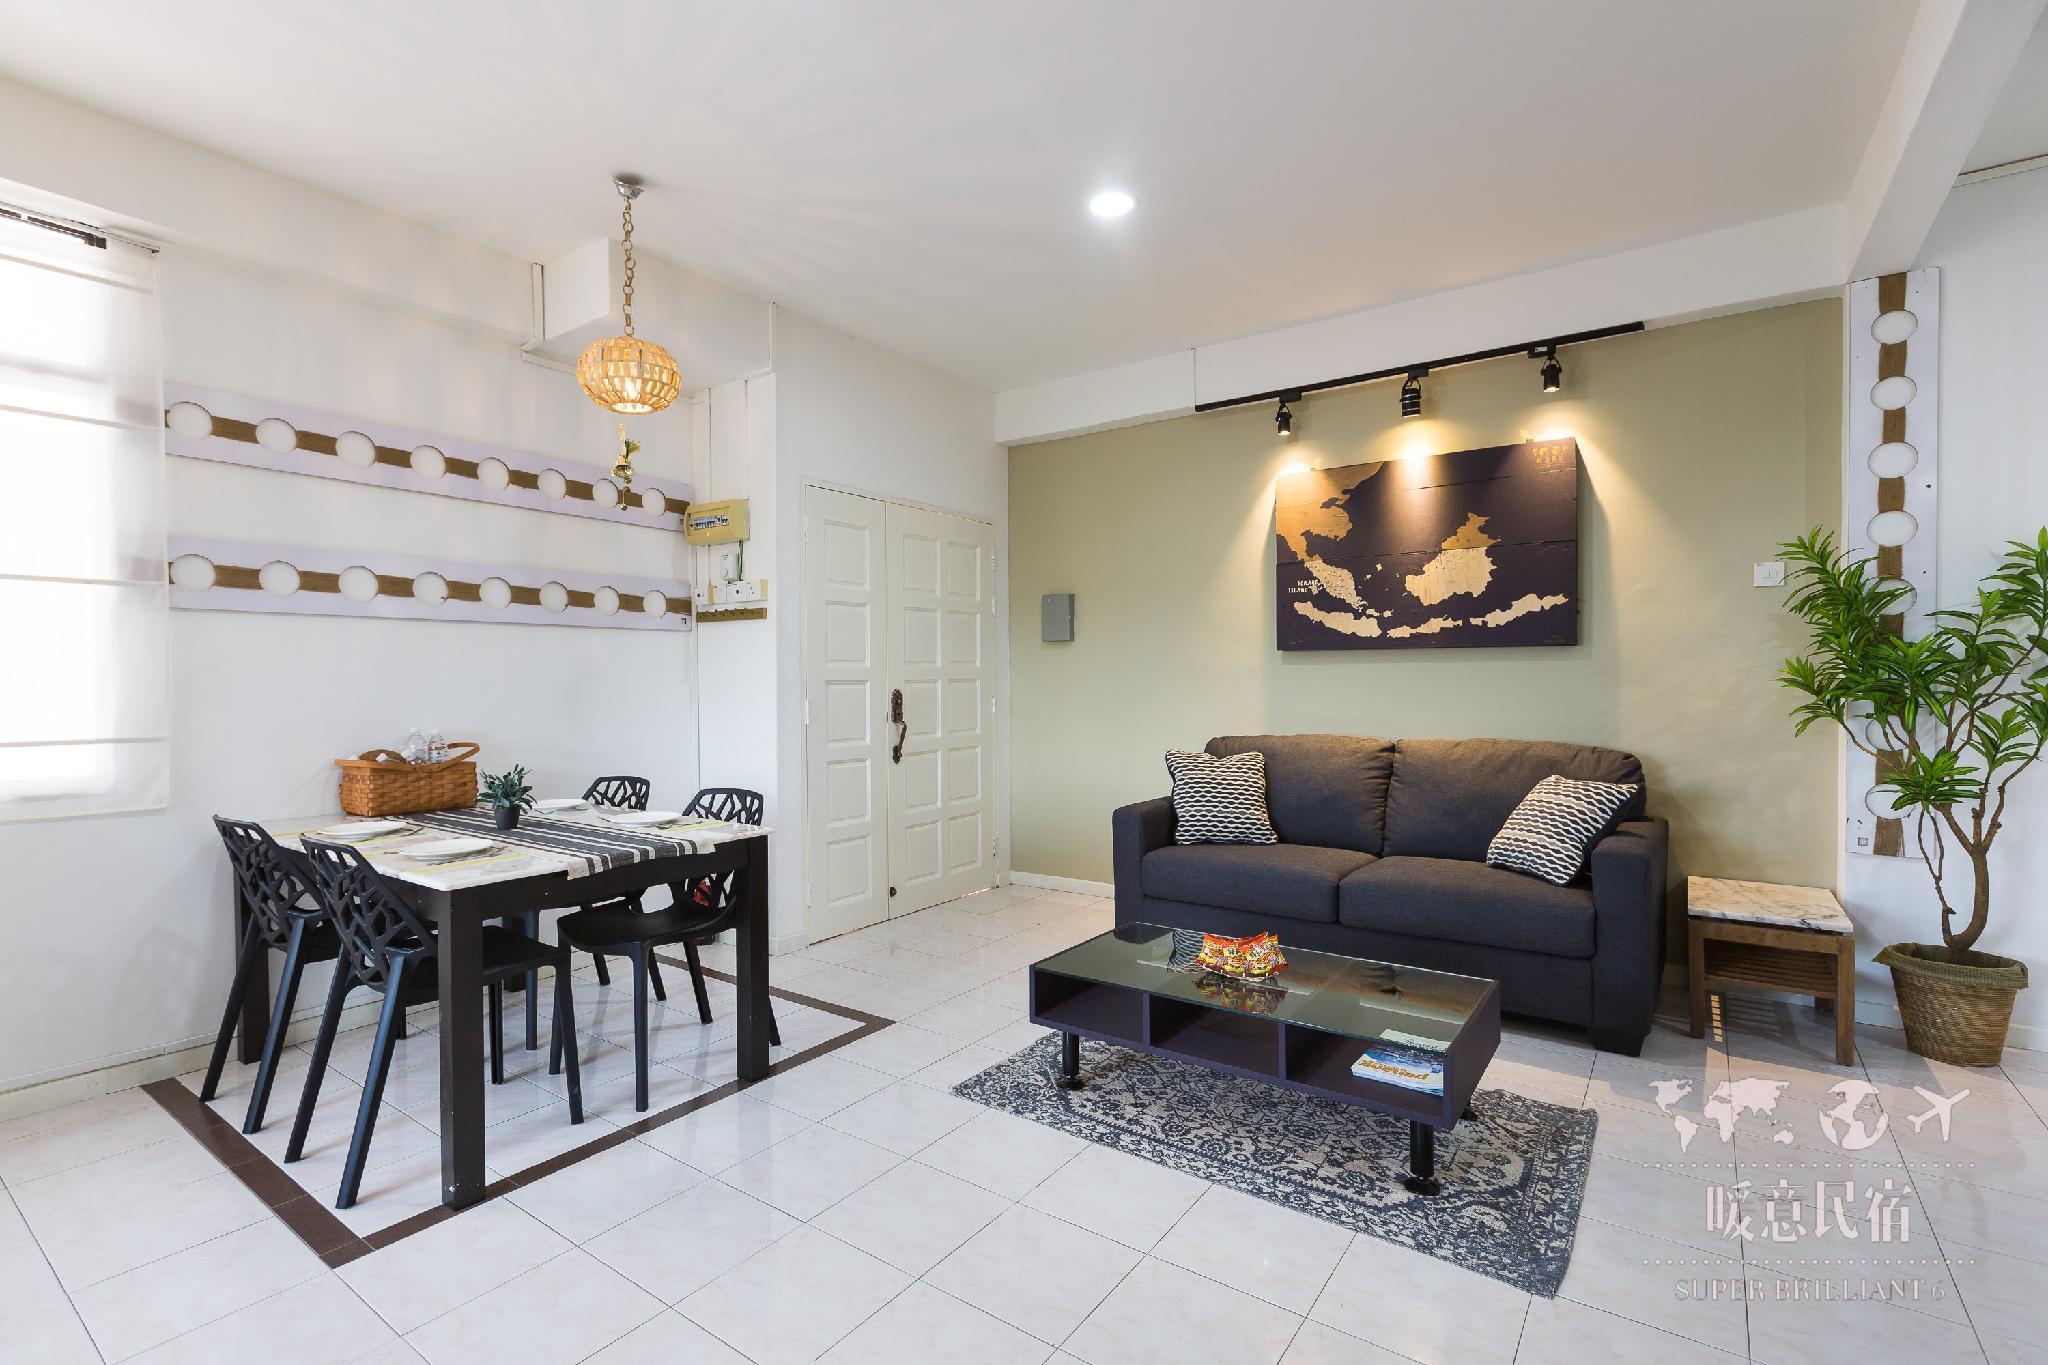 Georgetown Cozy Leisure Home